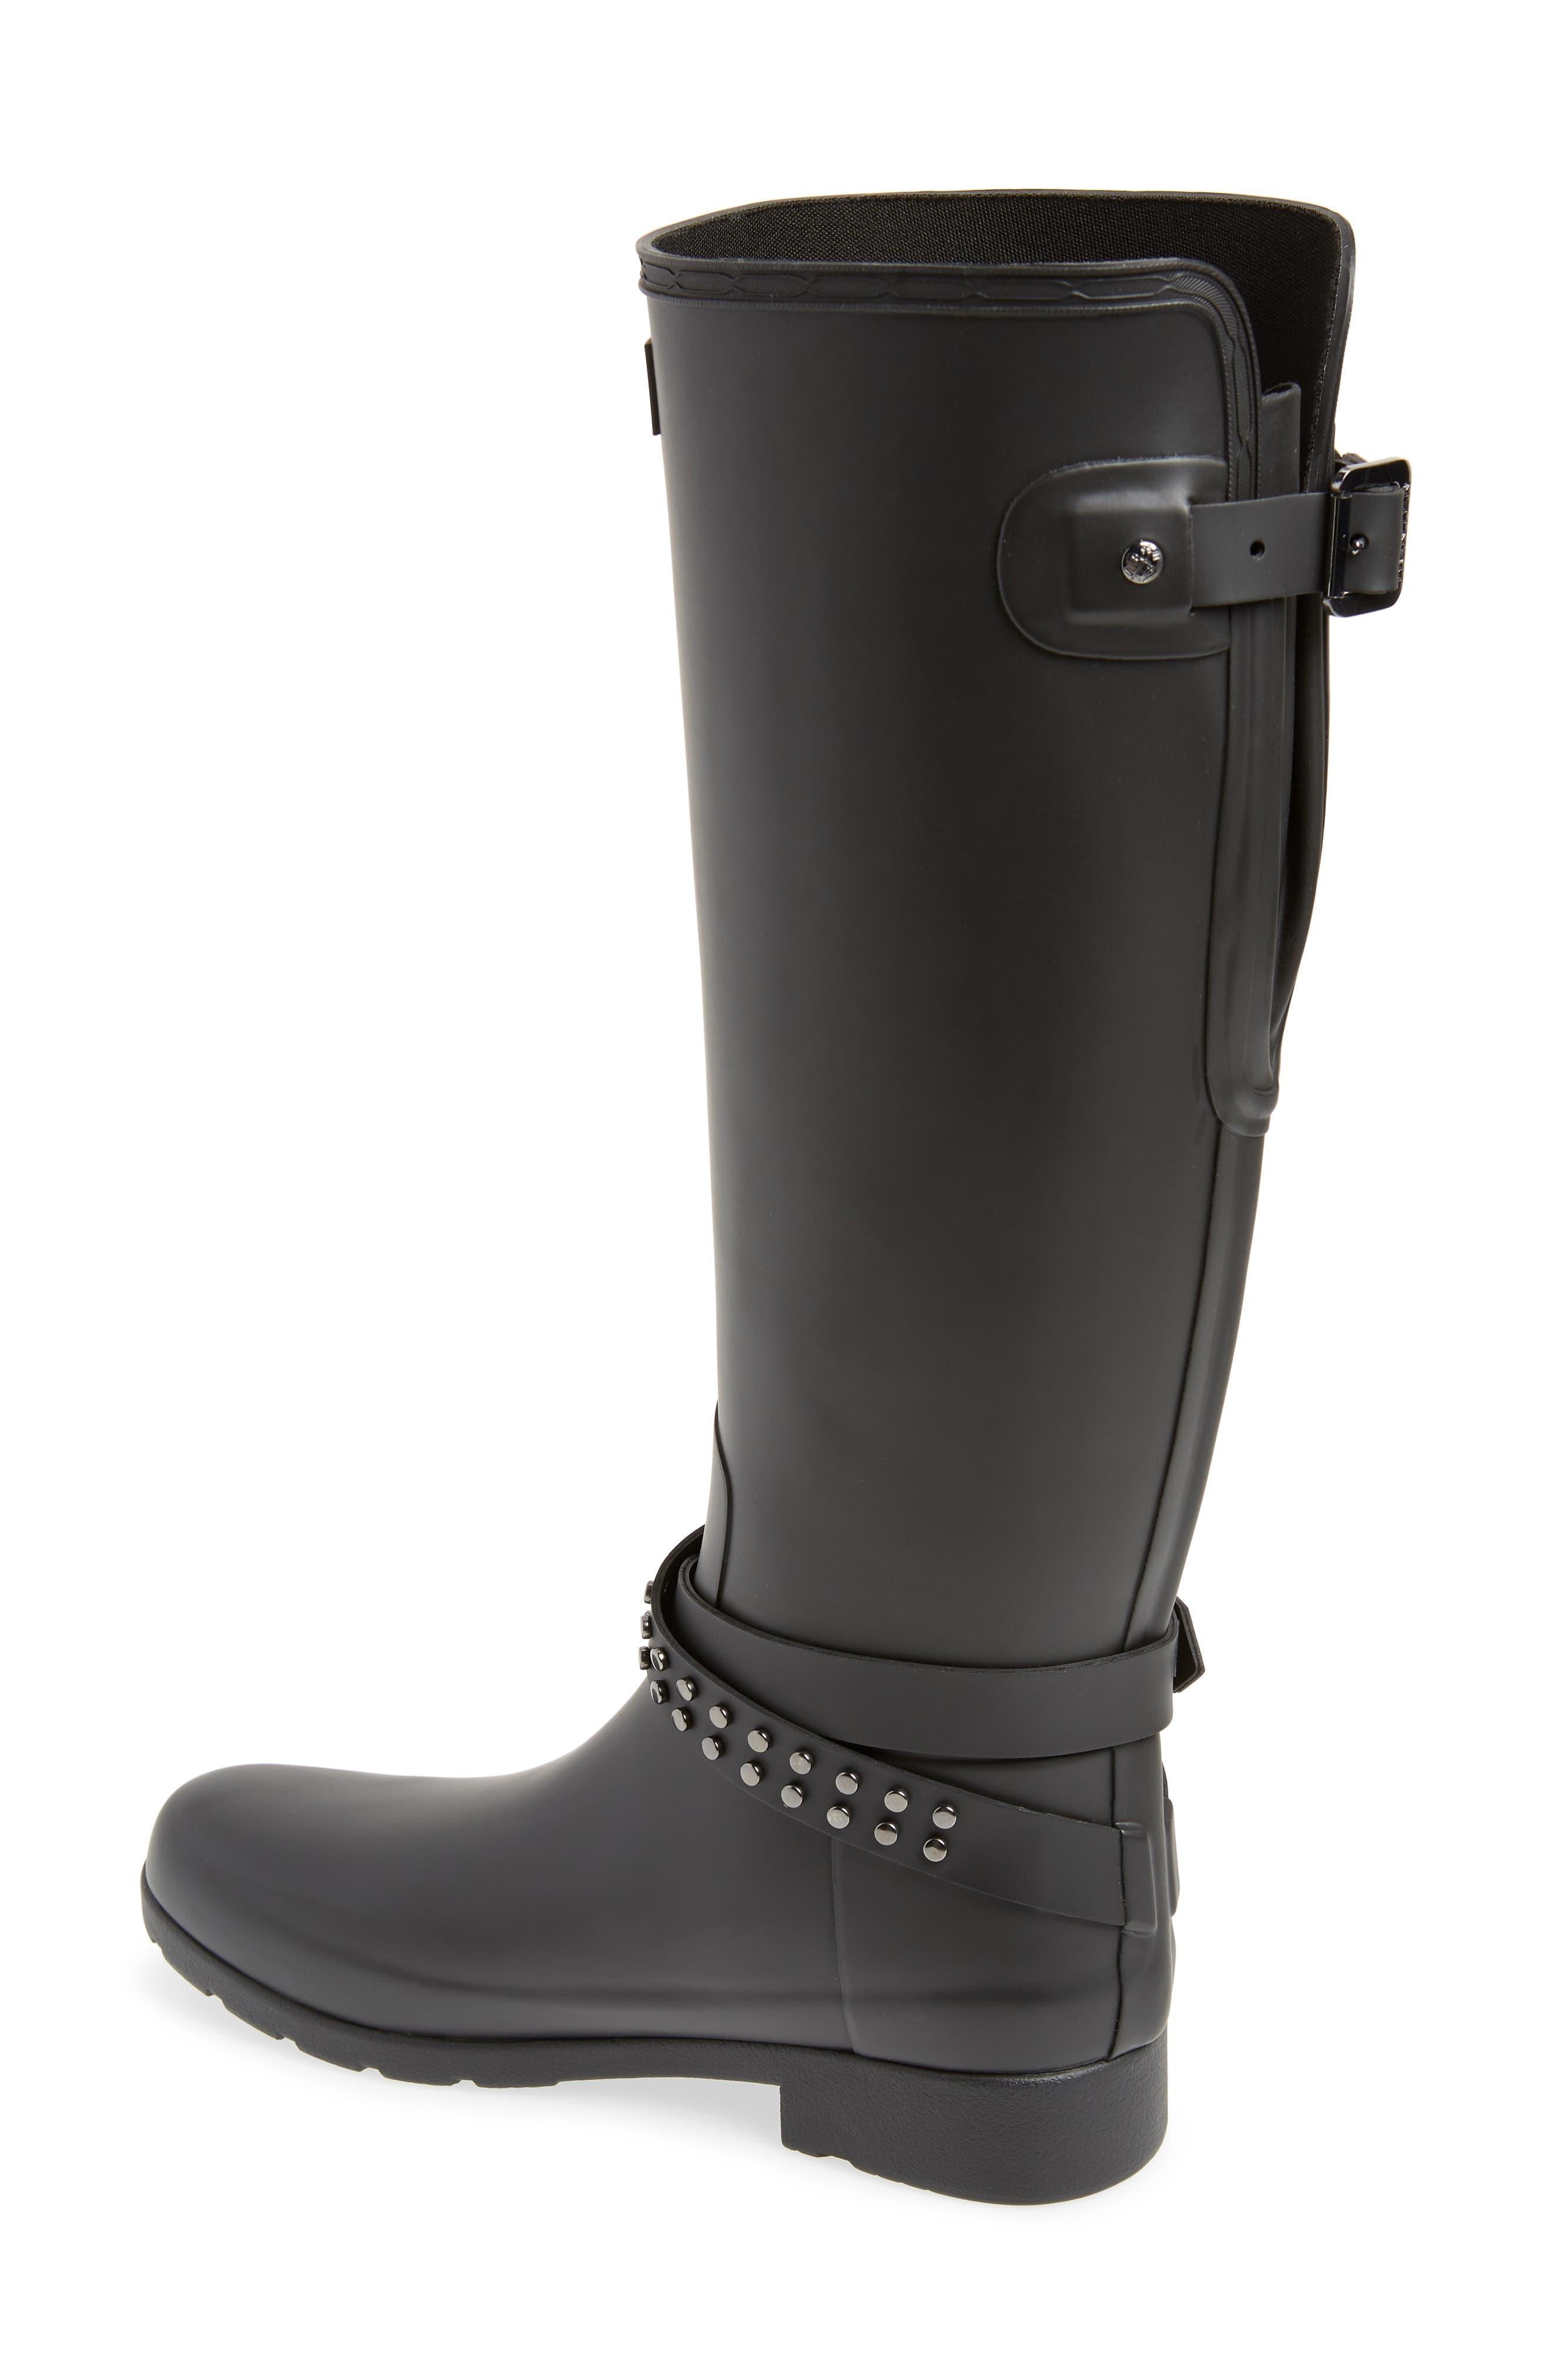 HUNTER, Refined Adjustable Back Knee High Waterproof Rain Boot, Alternate thumbnail 2, color, BLACK